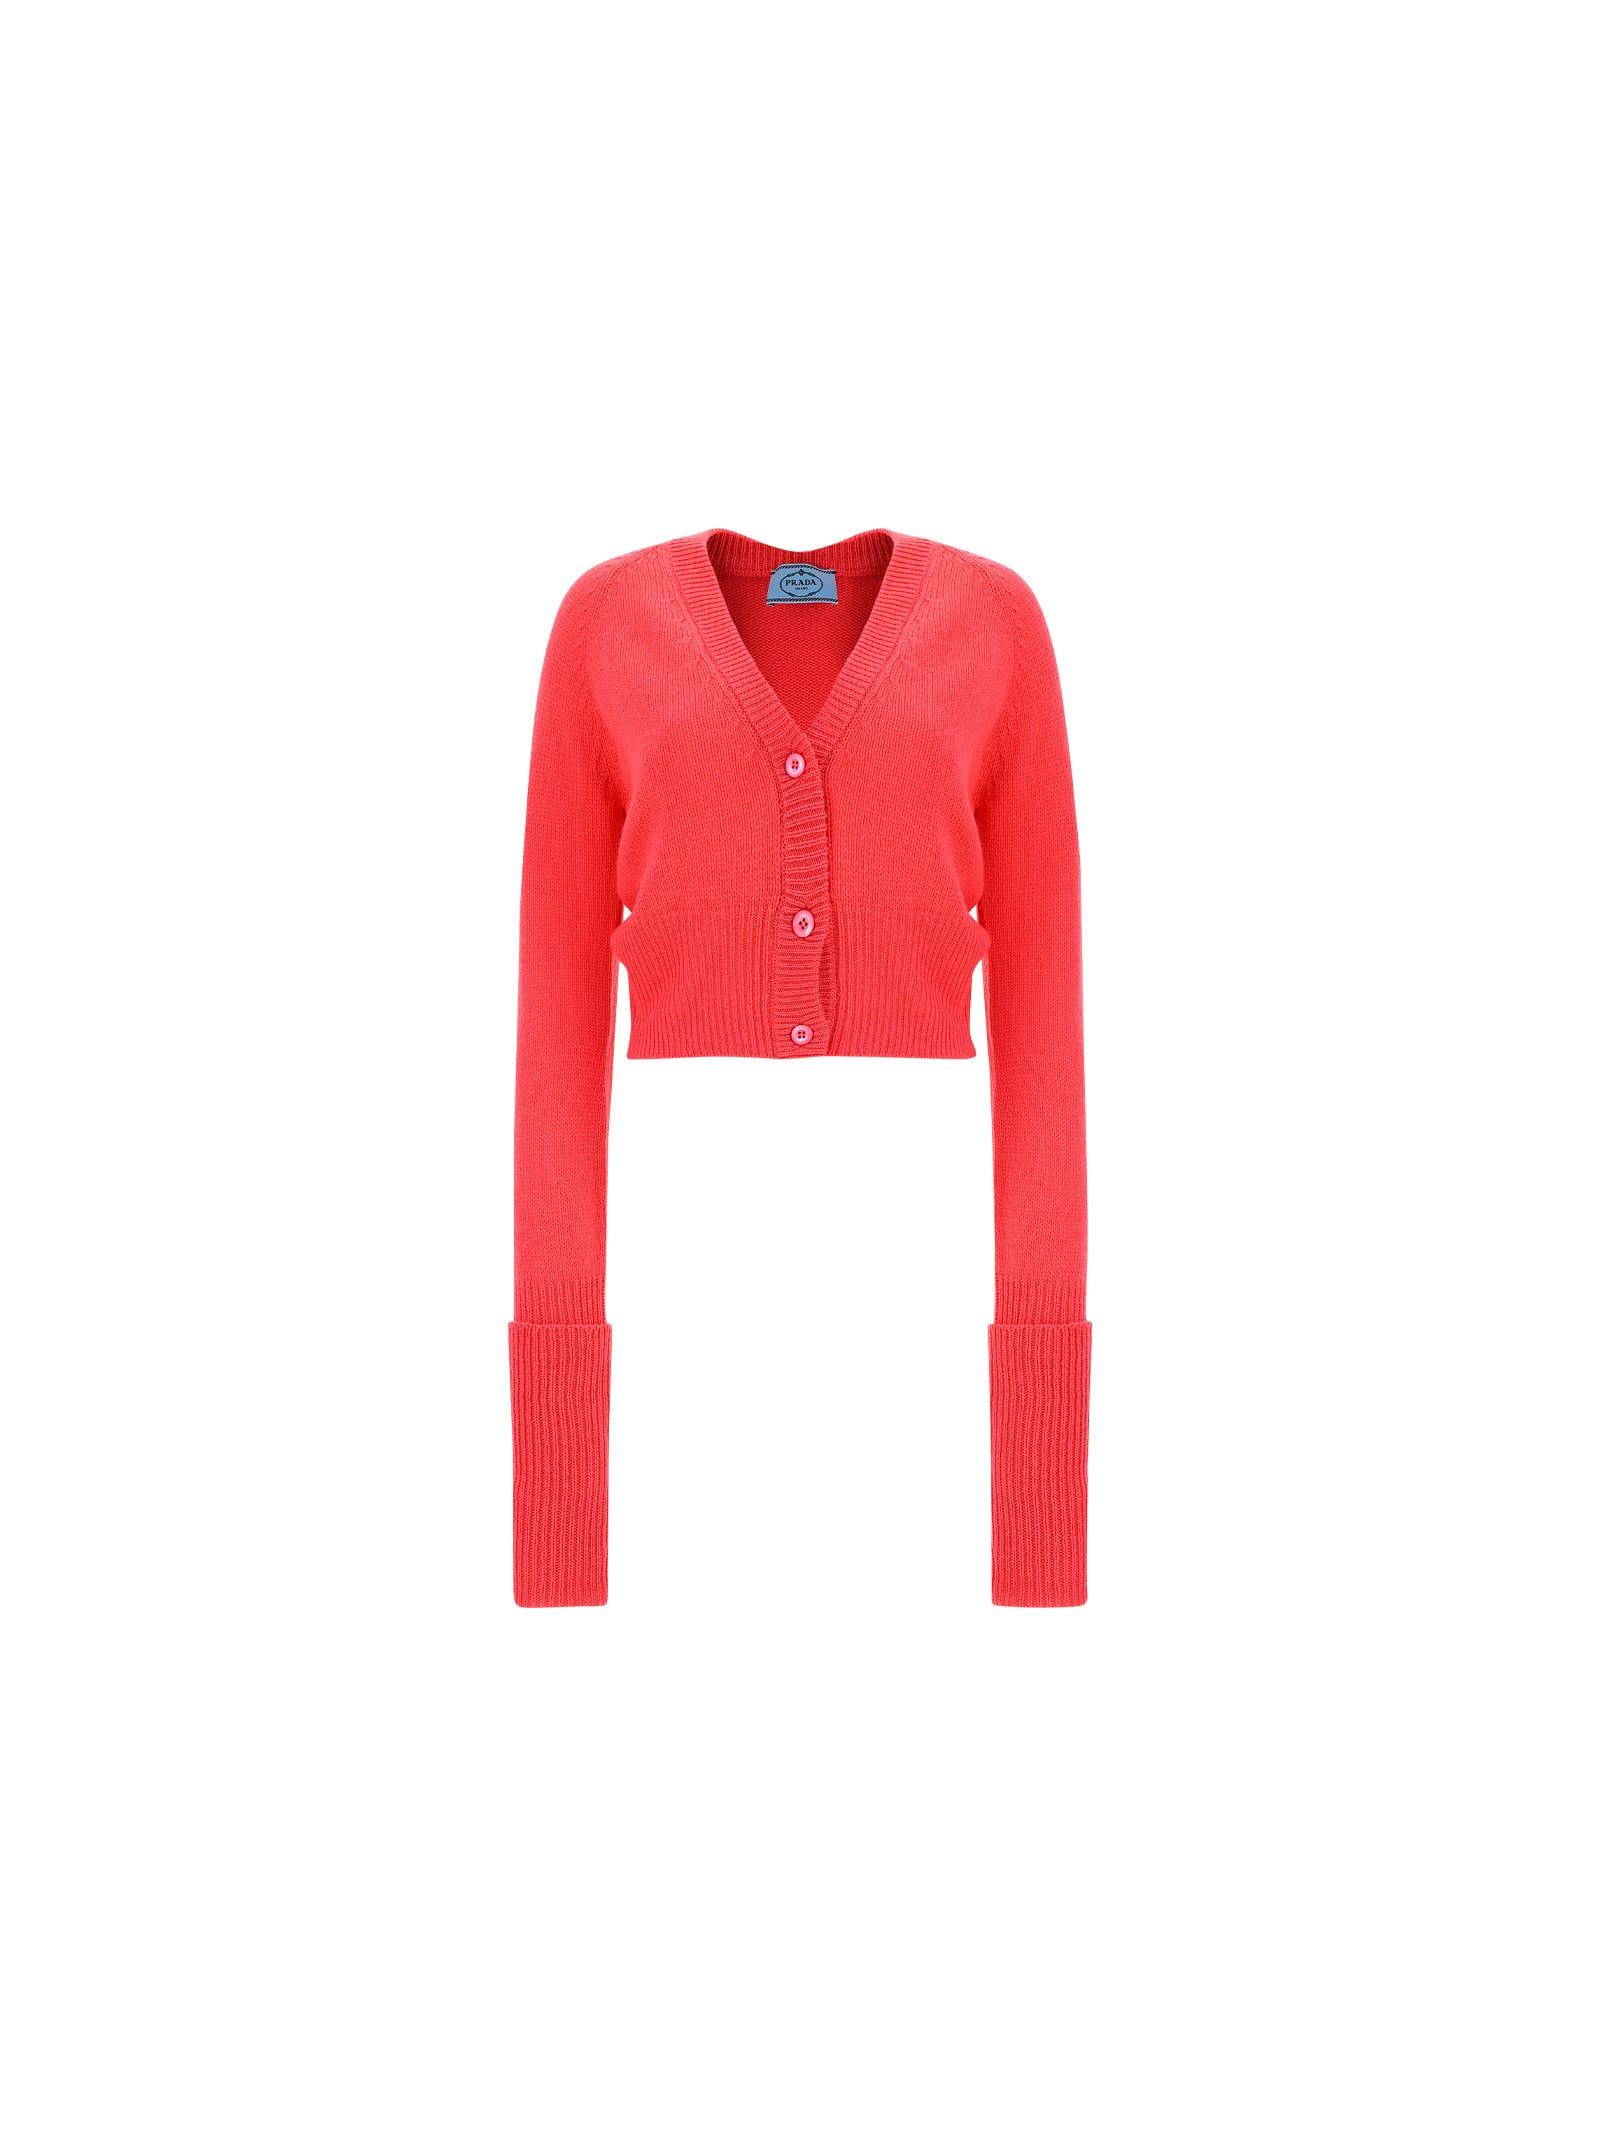 Prada Crop Sweater